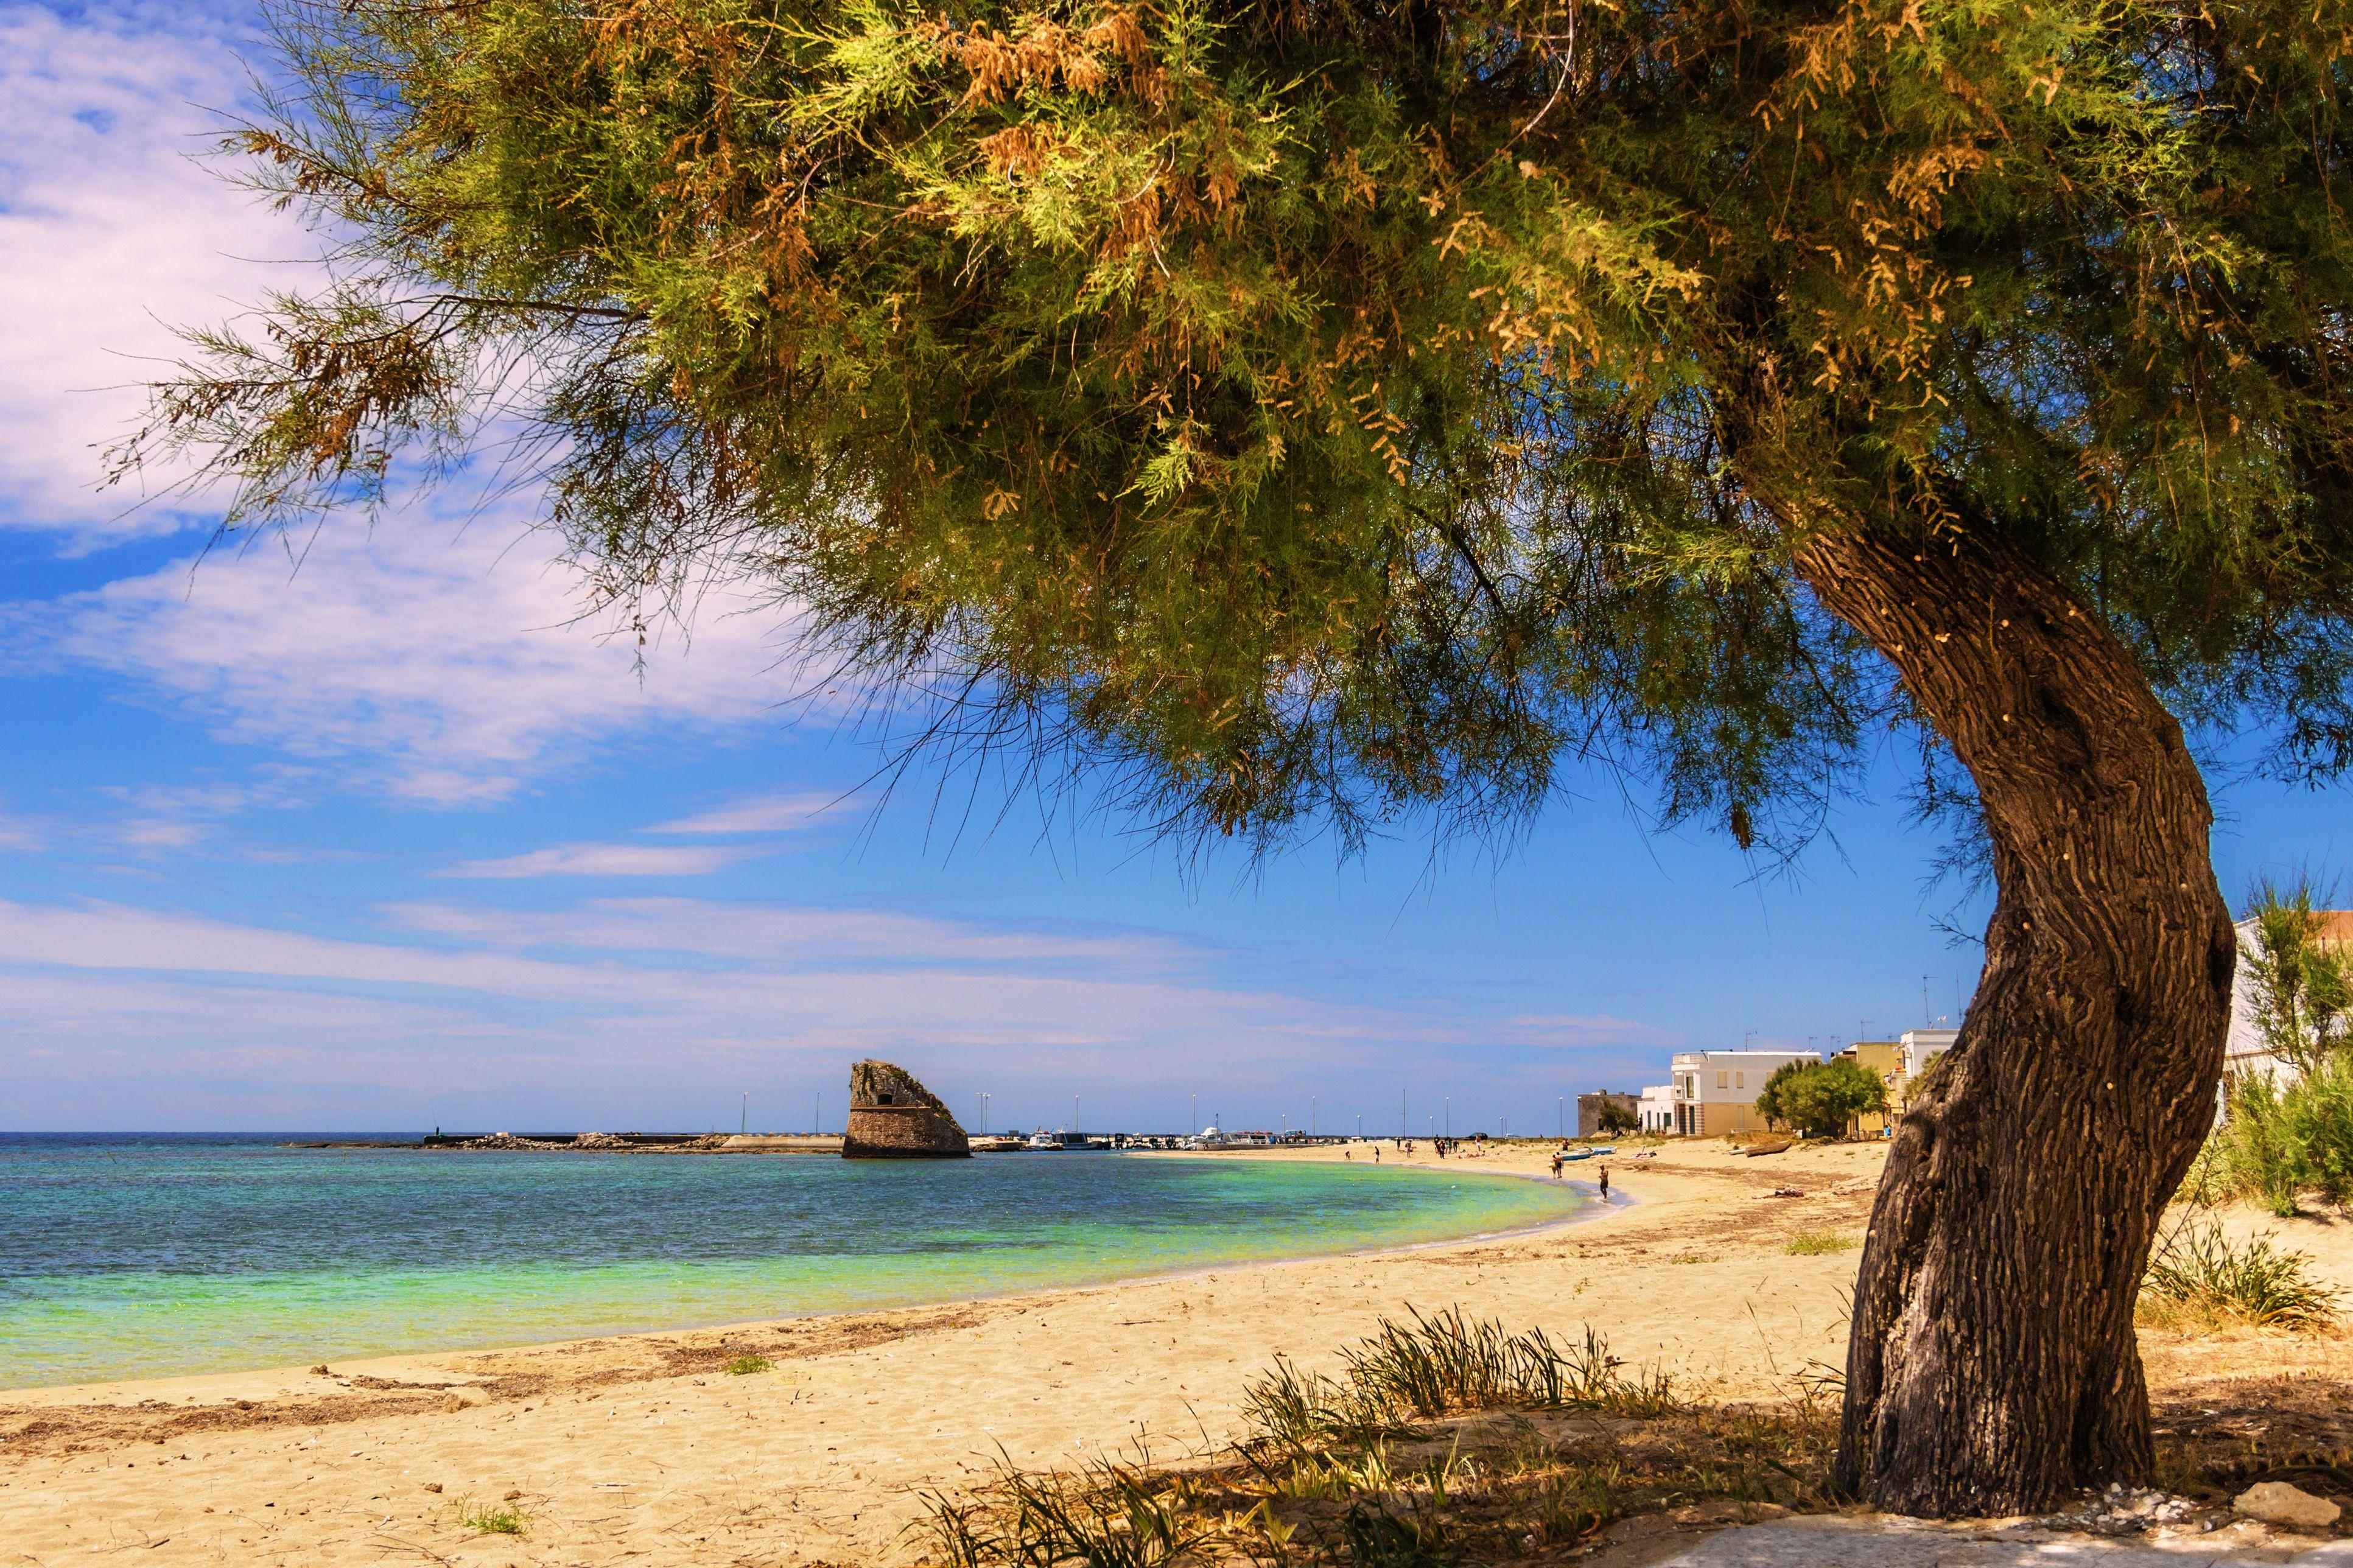 Torre Pali beach on Salento Peninsula